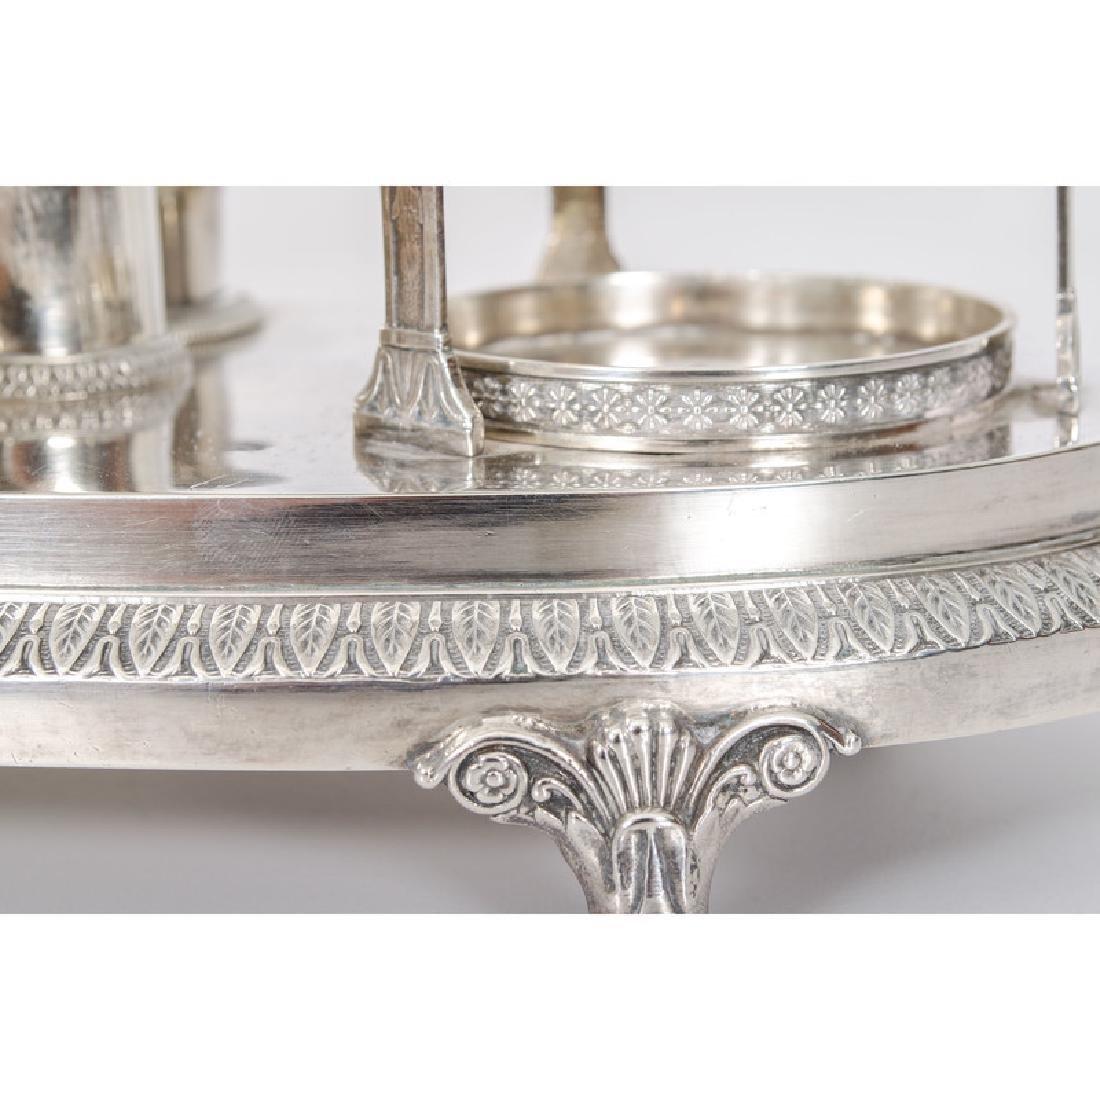 French First Standard Silver Cruet Stand - 3